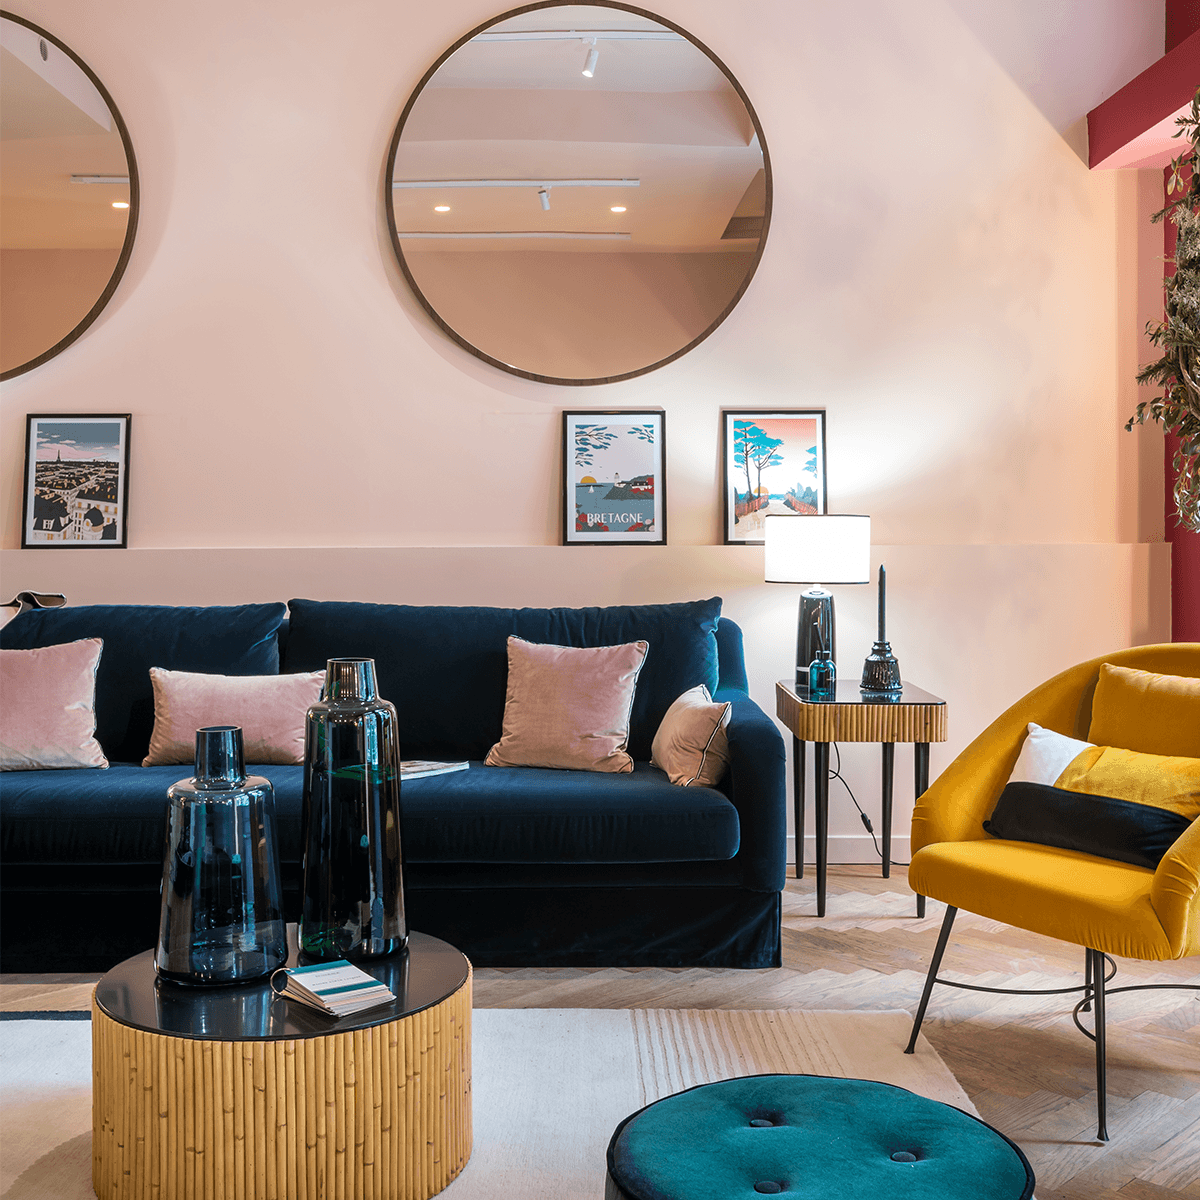 Nouvelle house in Lyon